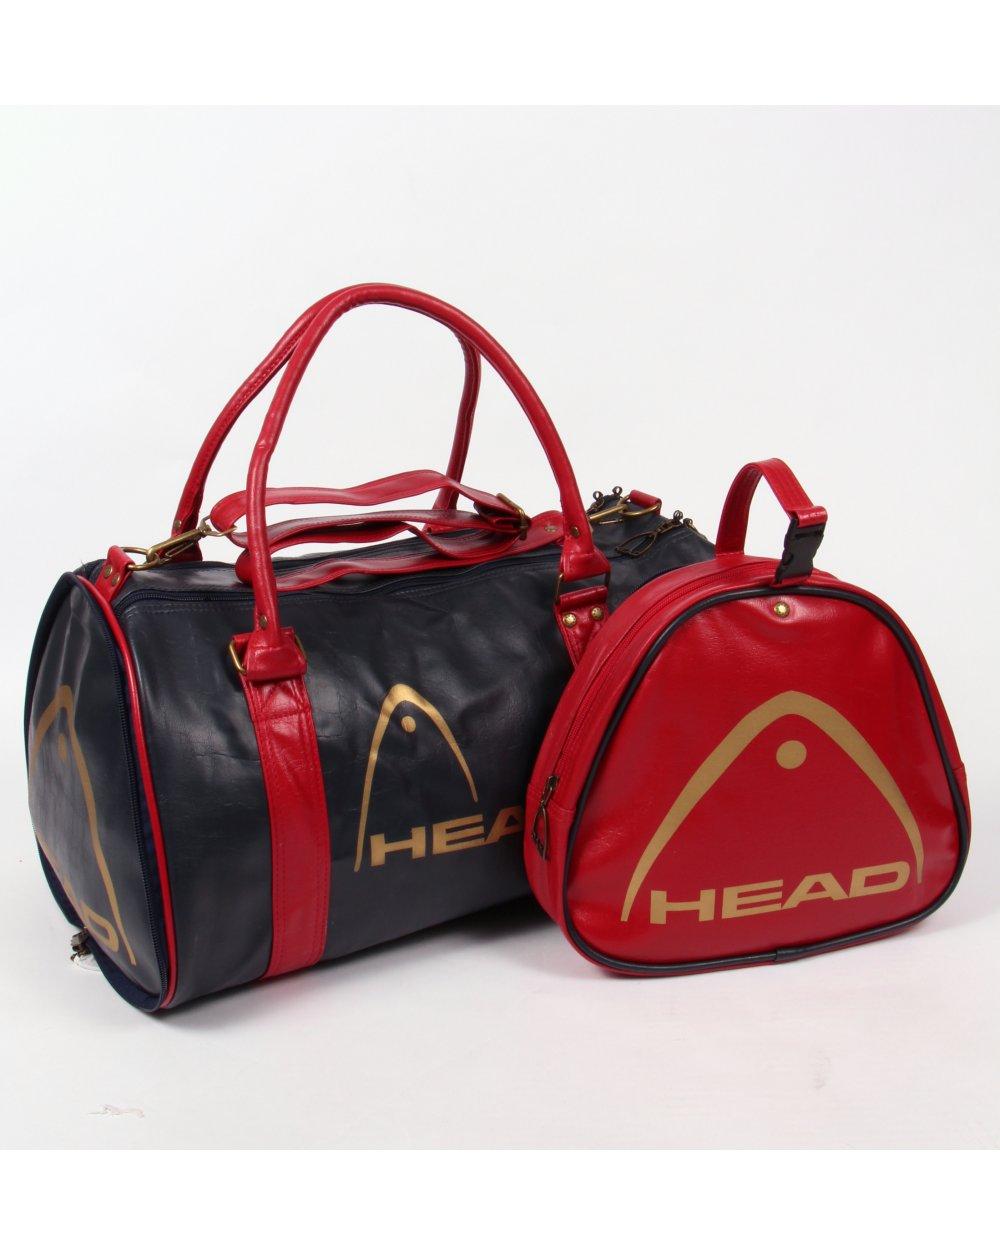 0d696442d Vintage Adidas Gym Bags- Fenix Toulouse Handball